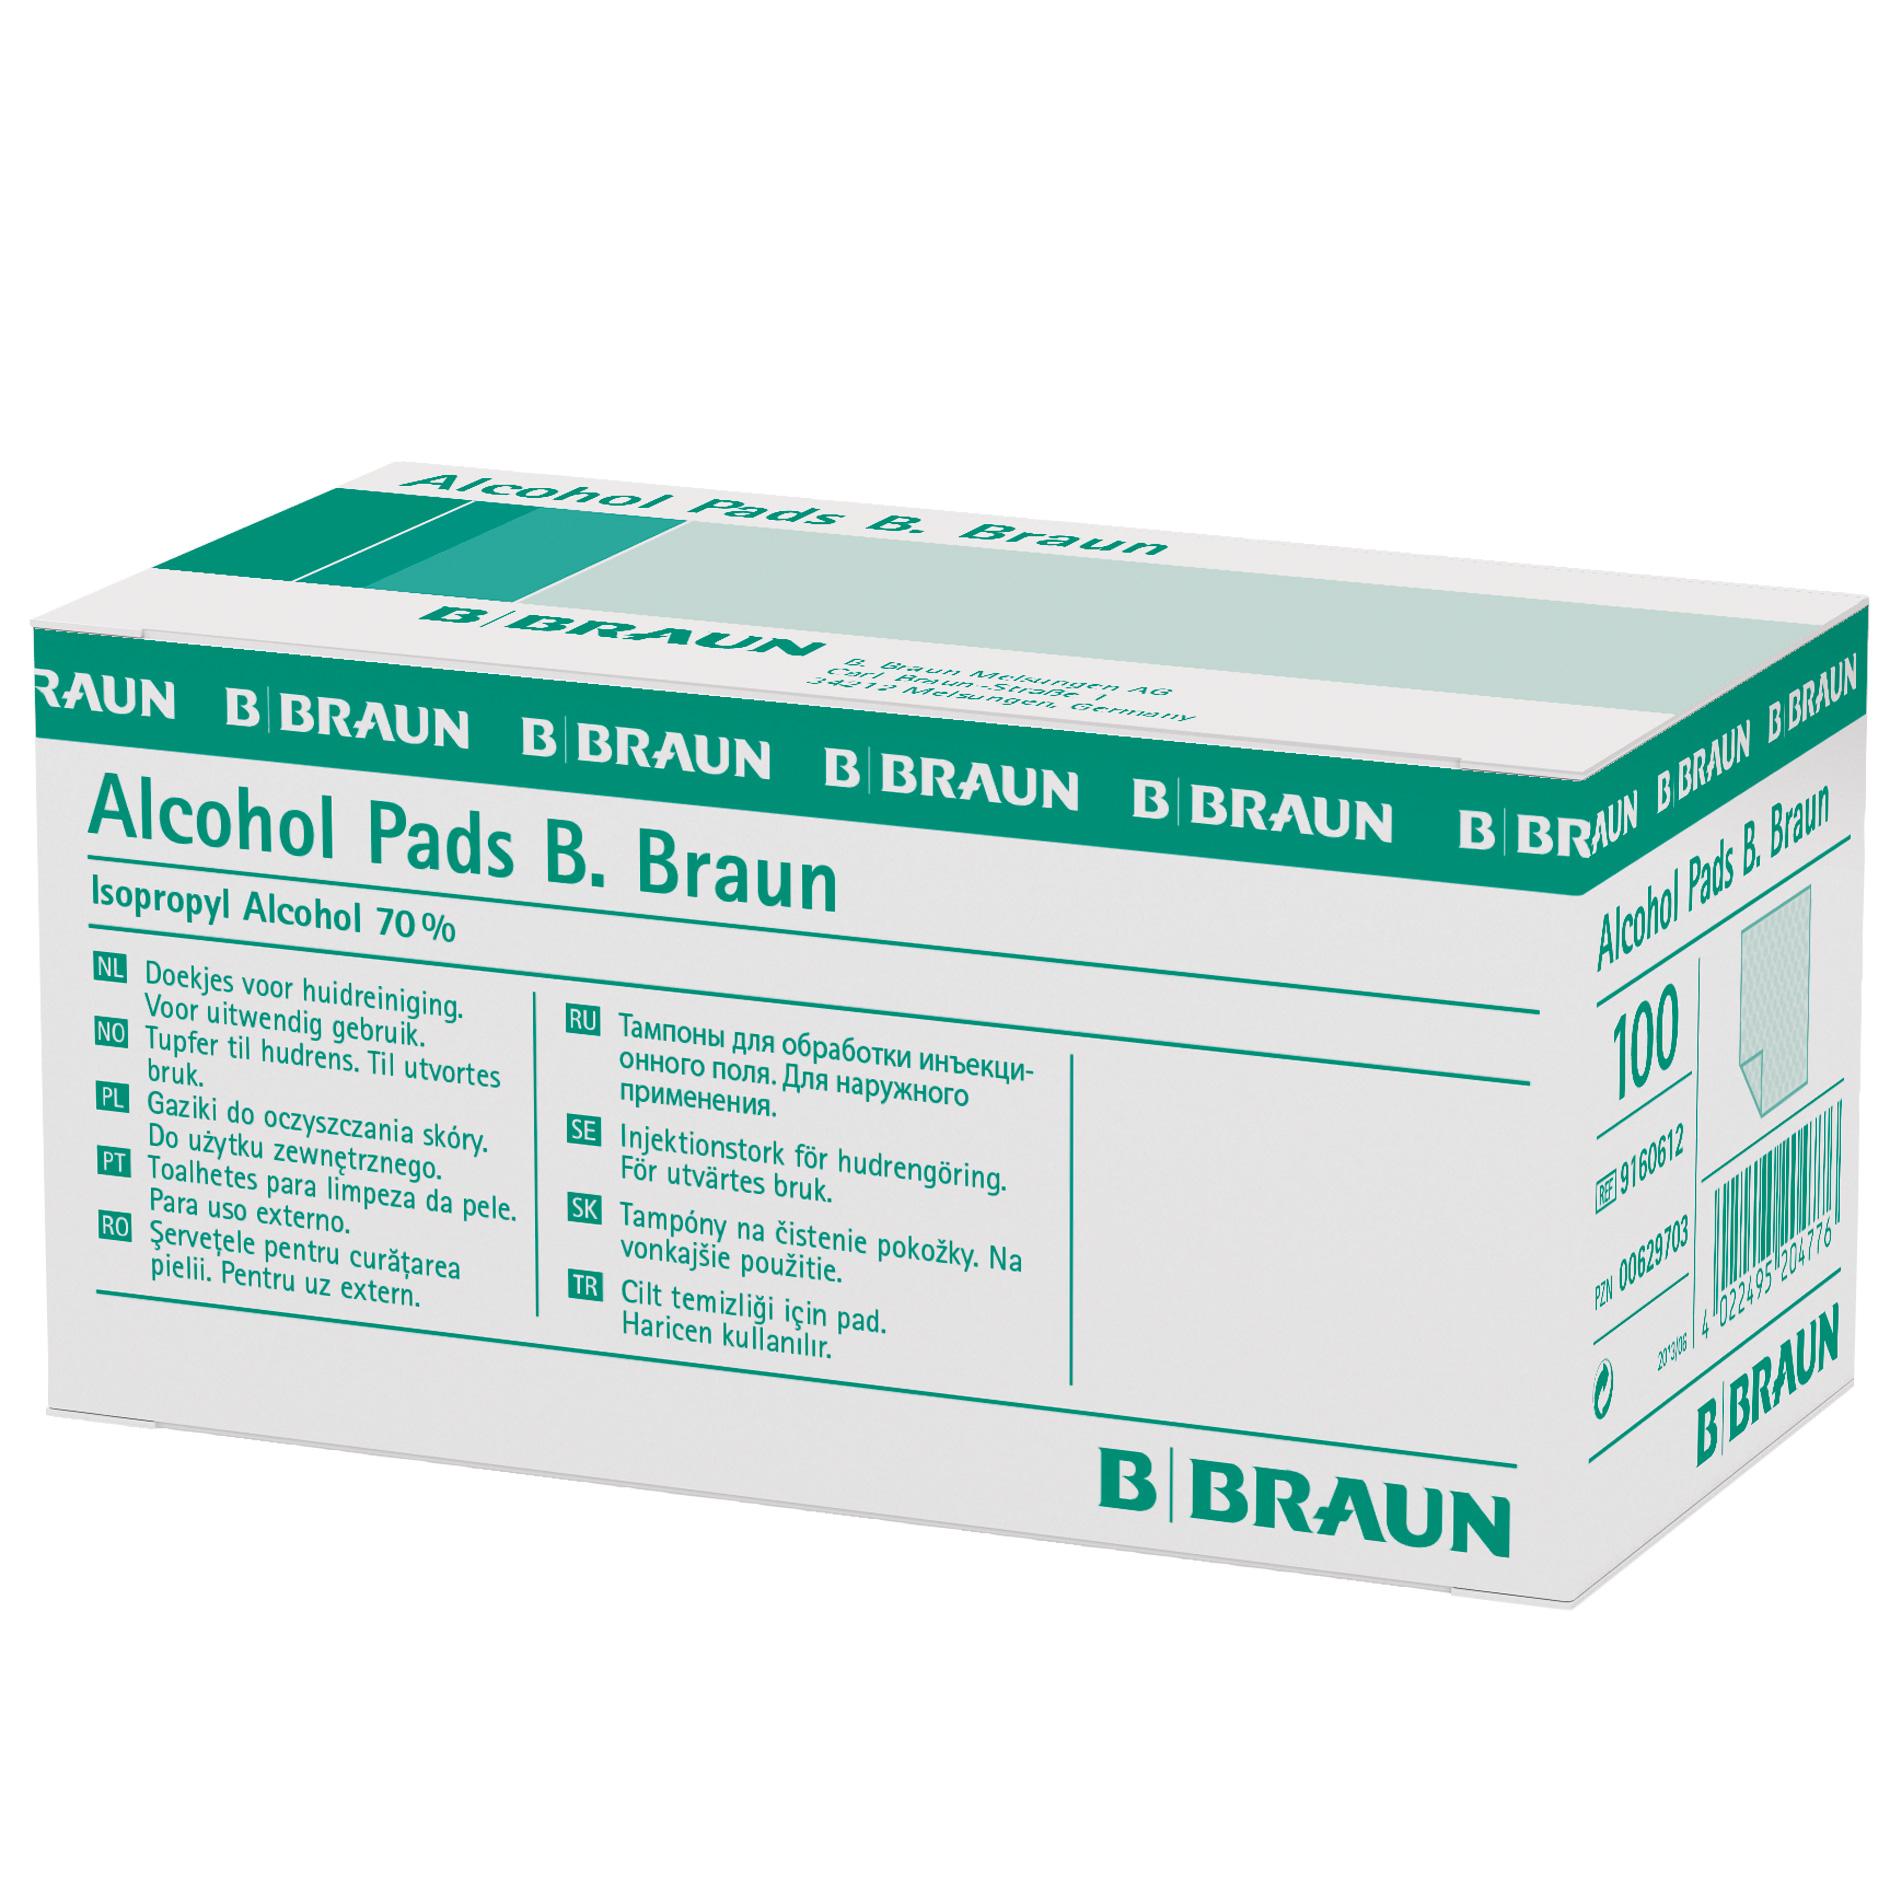 B. BRAUN Alcohol Pads, 100 Stück